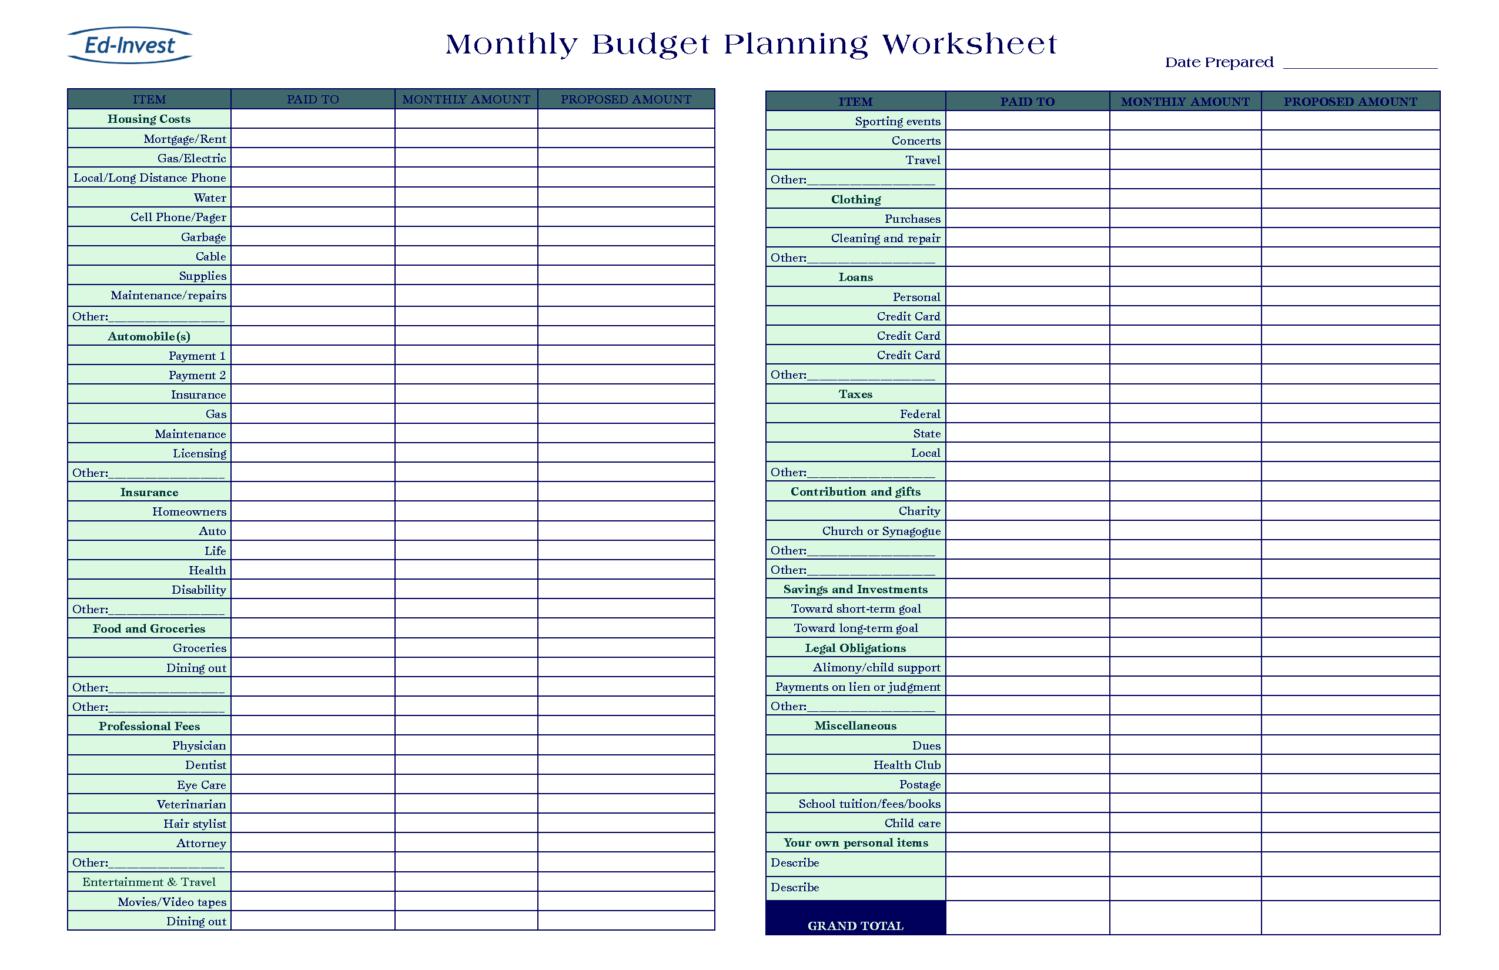 Budget Planner Spreadsheet Template Regarding Excel Spreadsheet Budget Planner Free Canre Klonec Co Planning